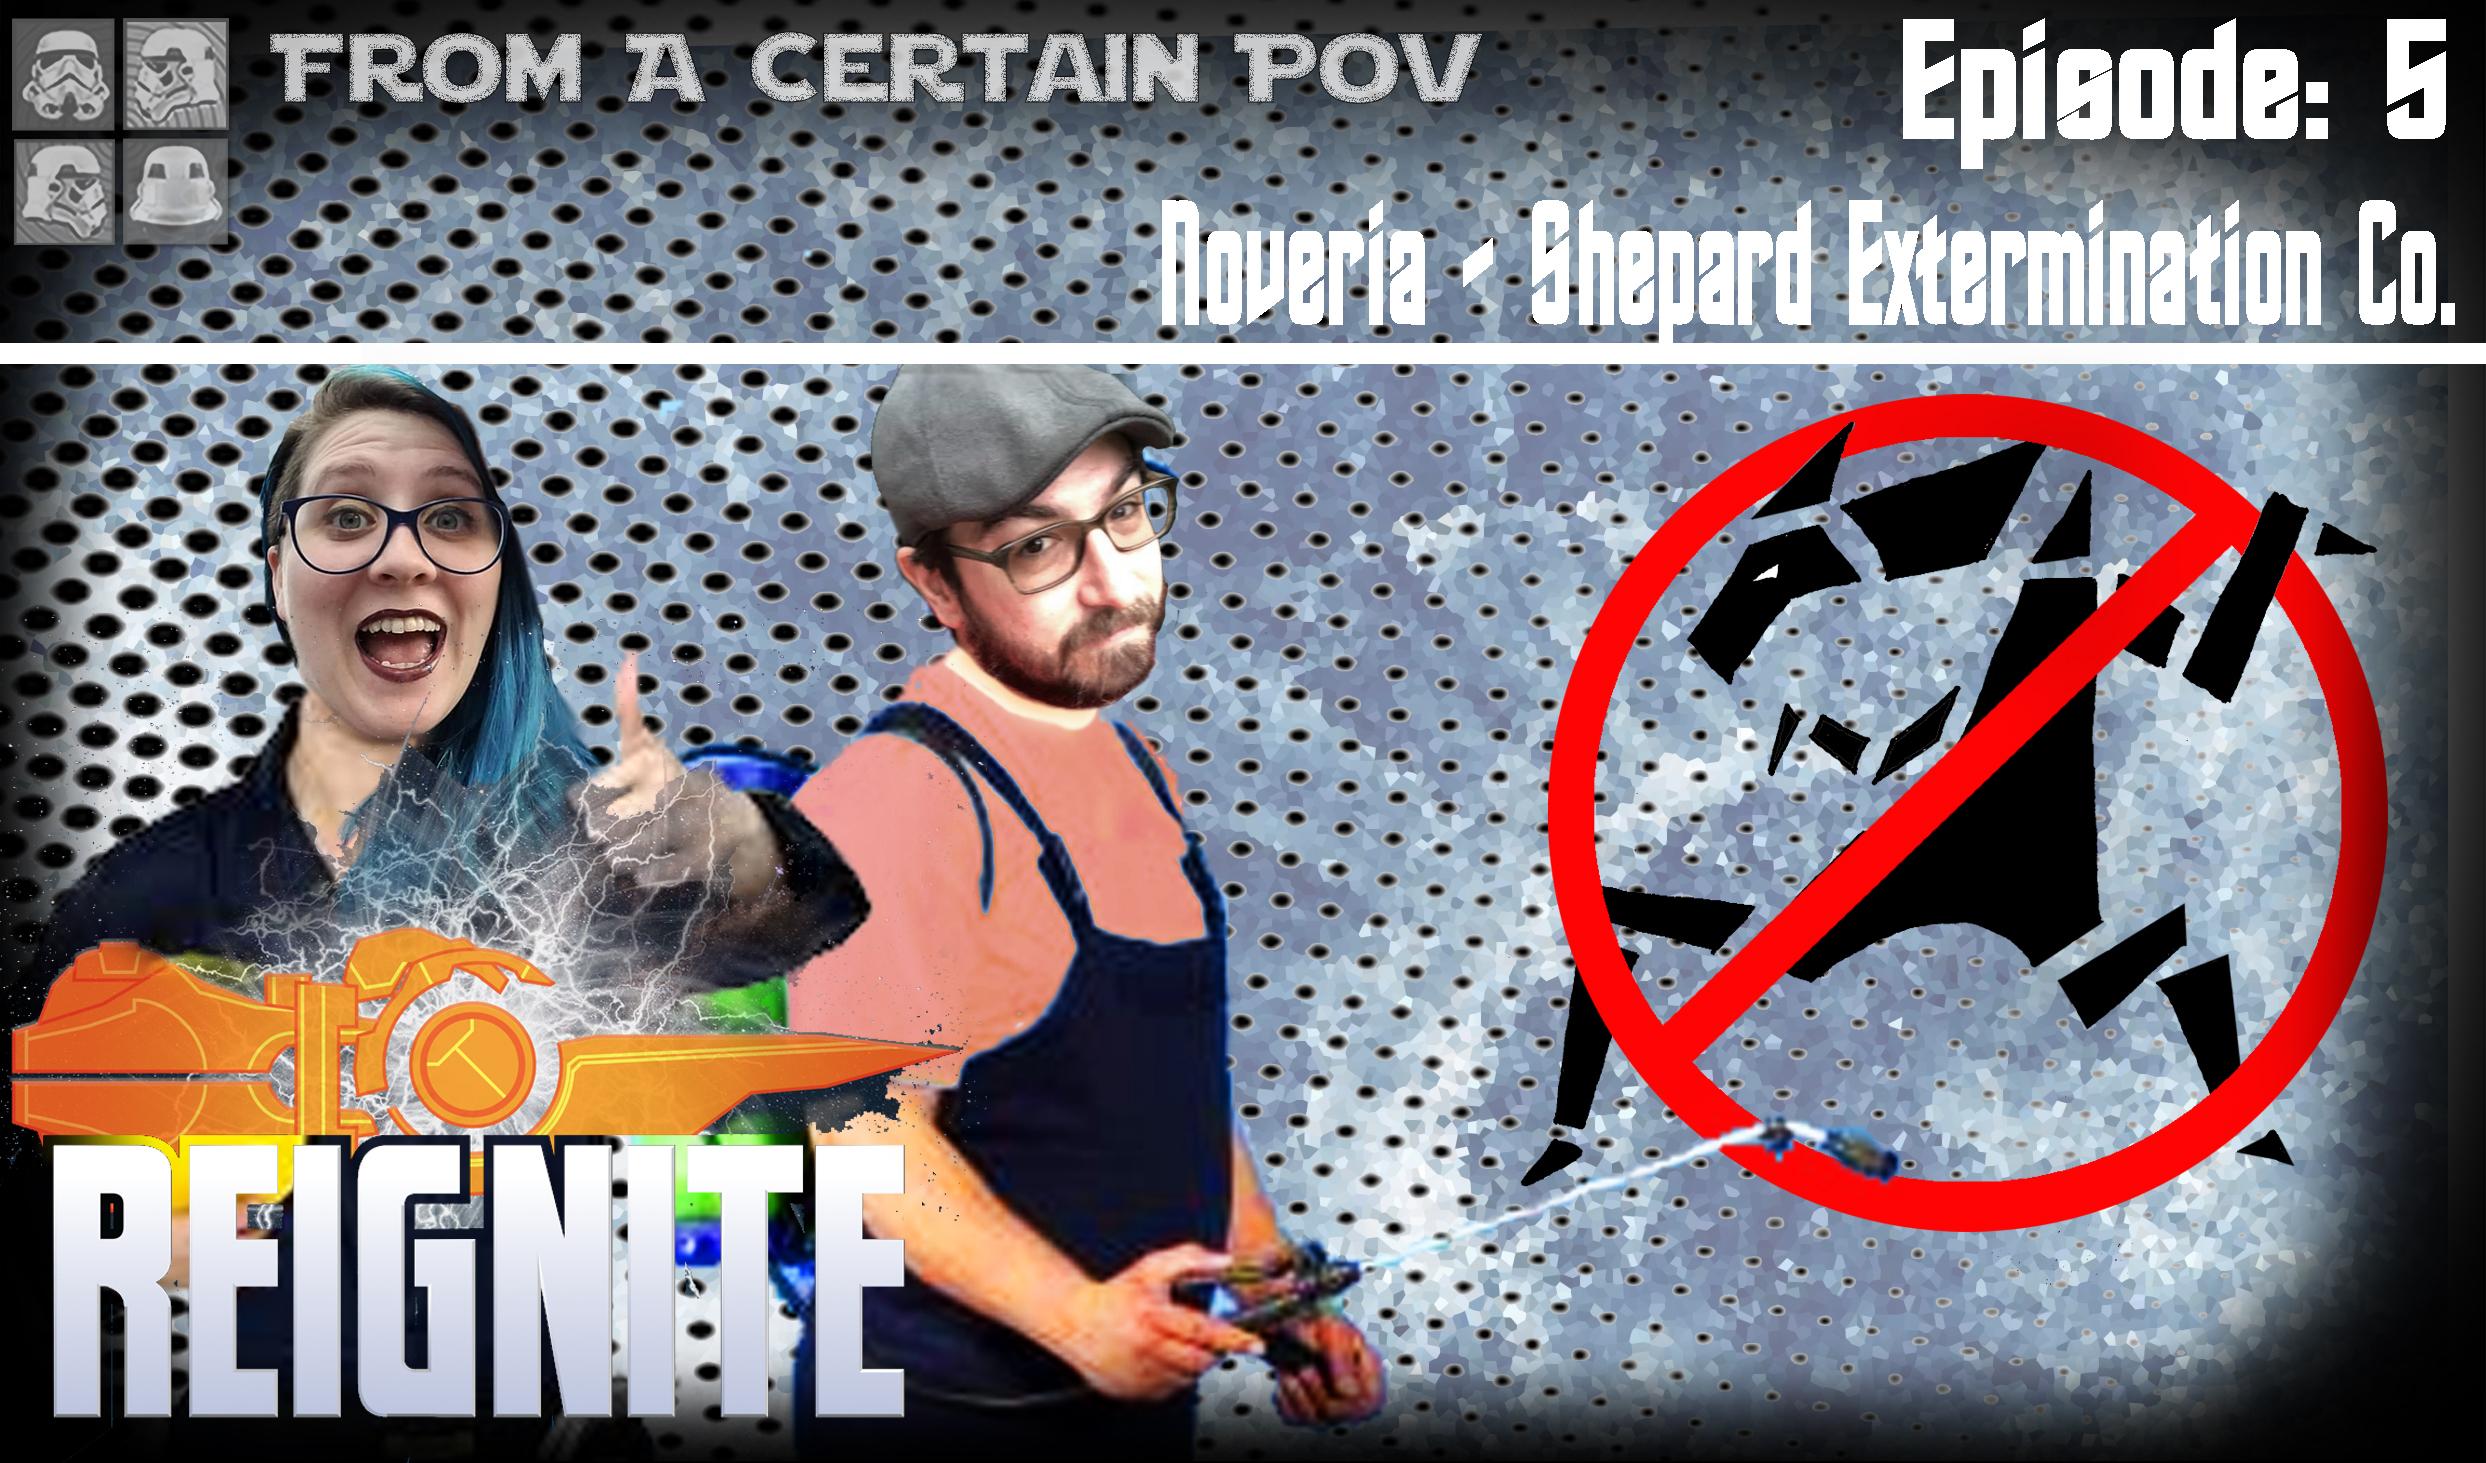 5 - Noveria - Shepard Extermination Co..jpg